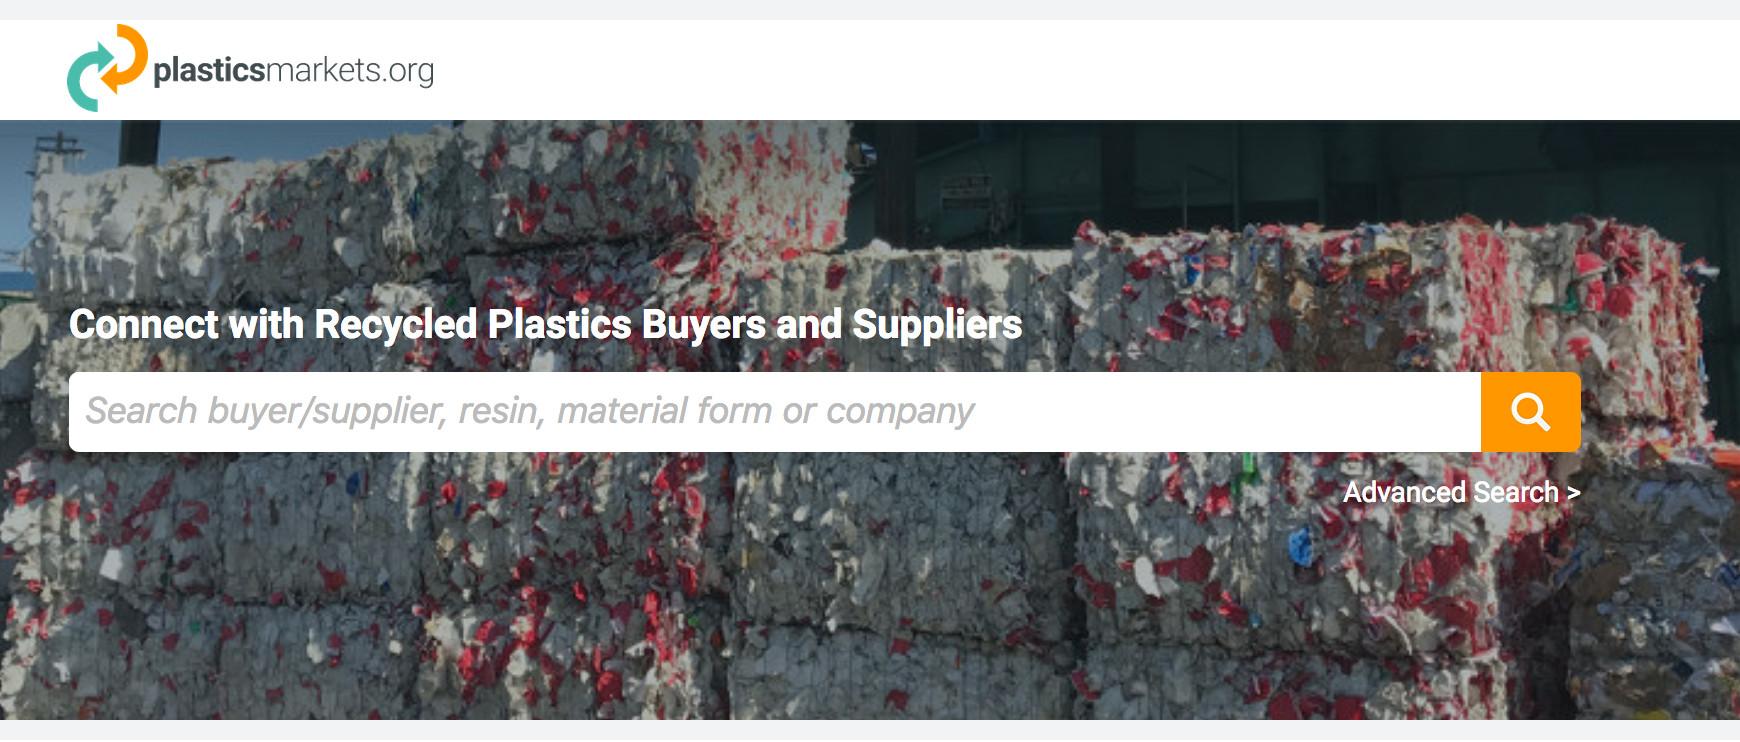 Plastics Markets